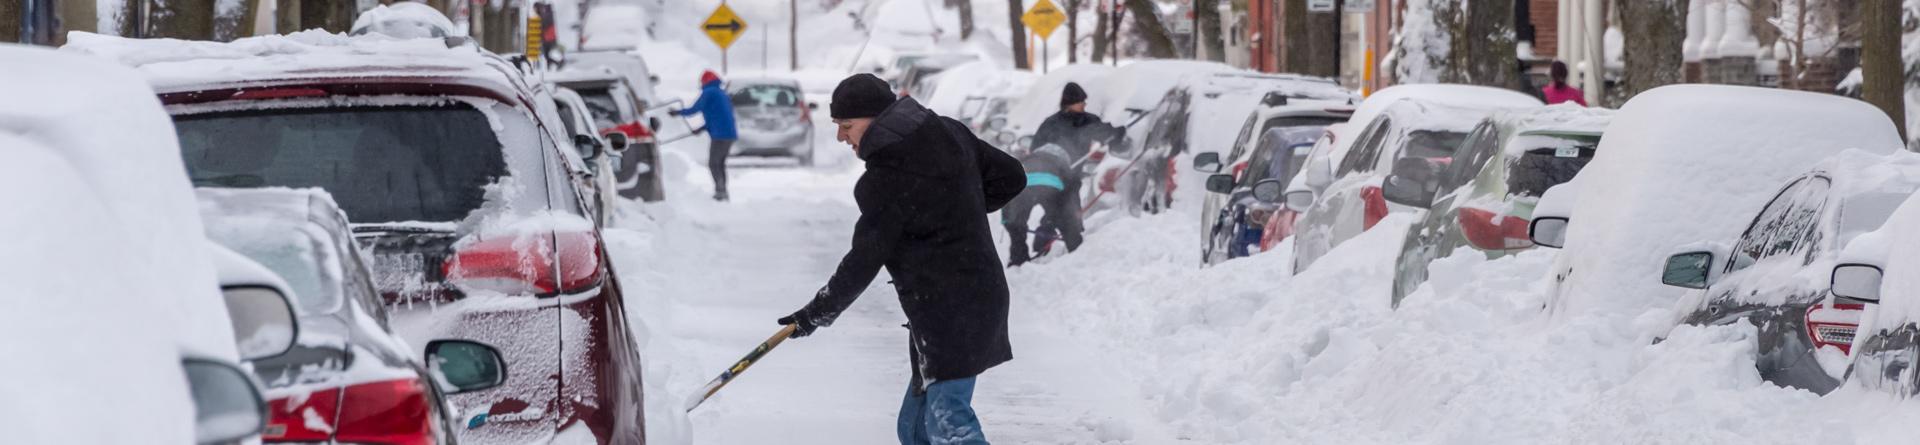 Man shoveling his driveway